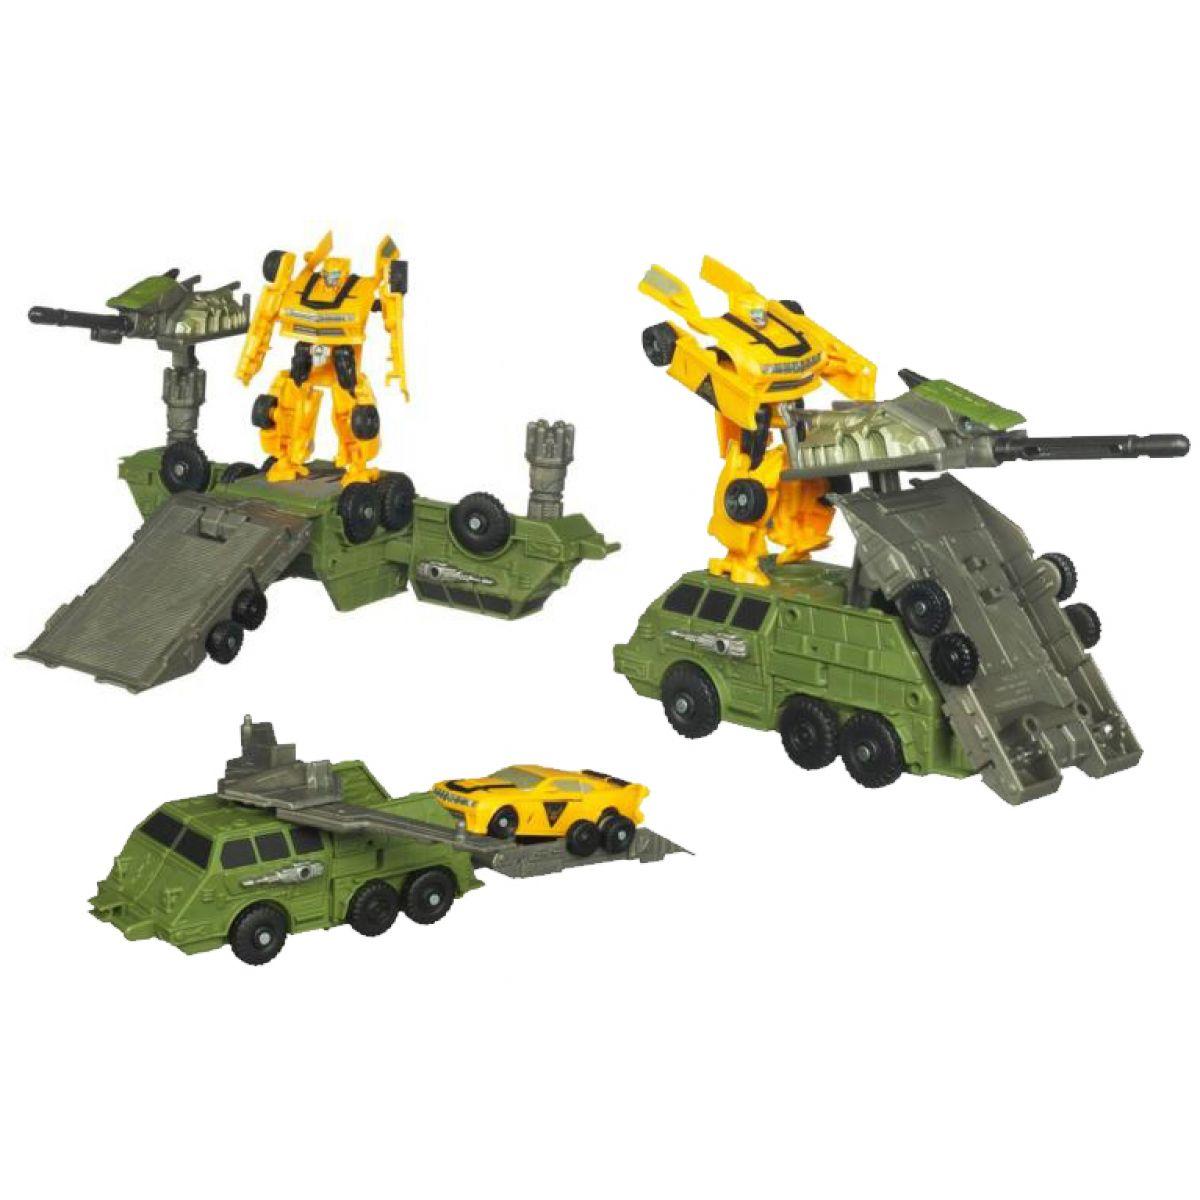 Transformers Cyberverse hrací set Hasbro 28706 - Megatron Blastwave Weapons